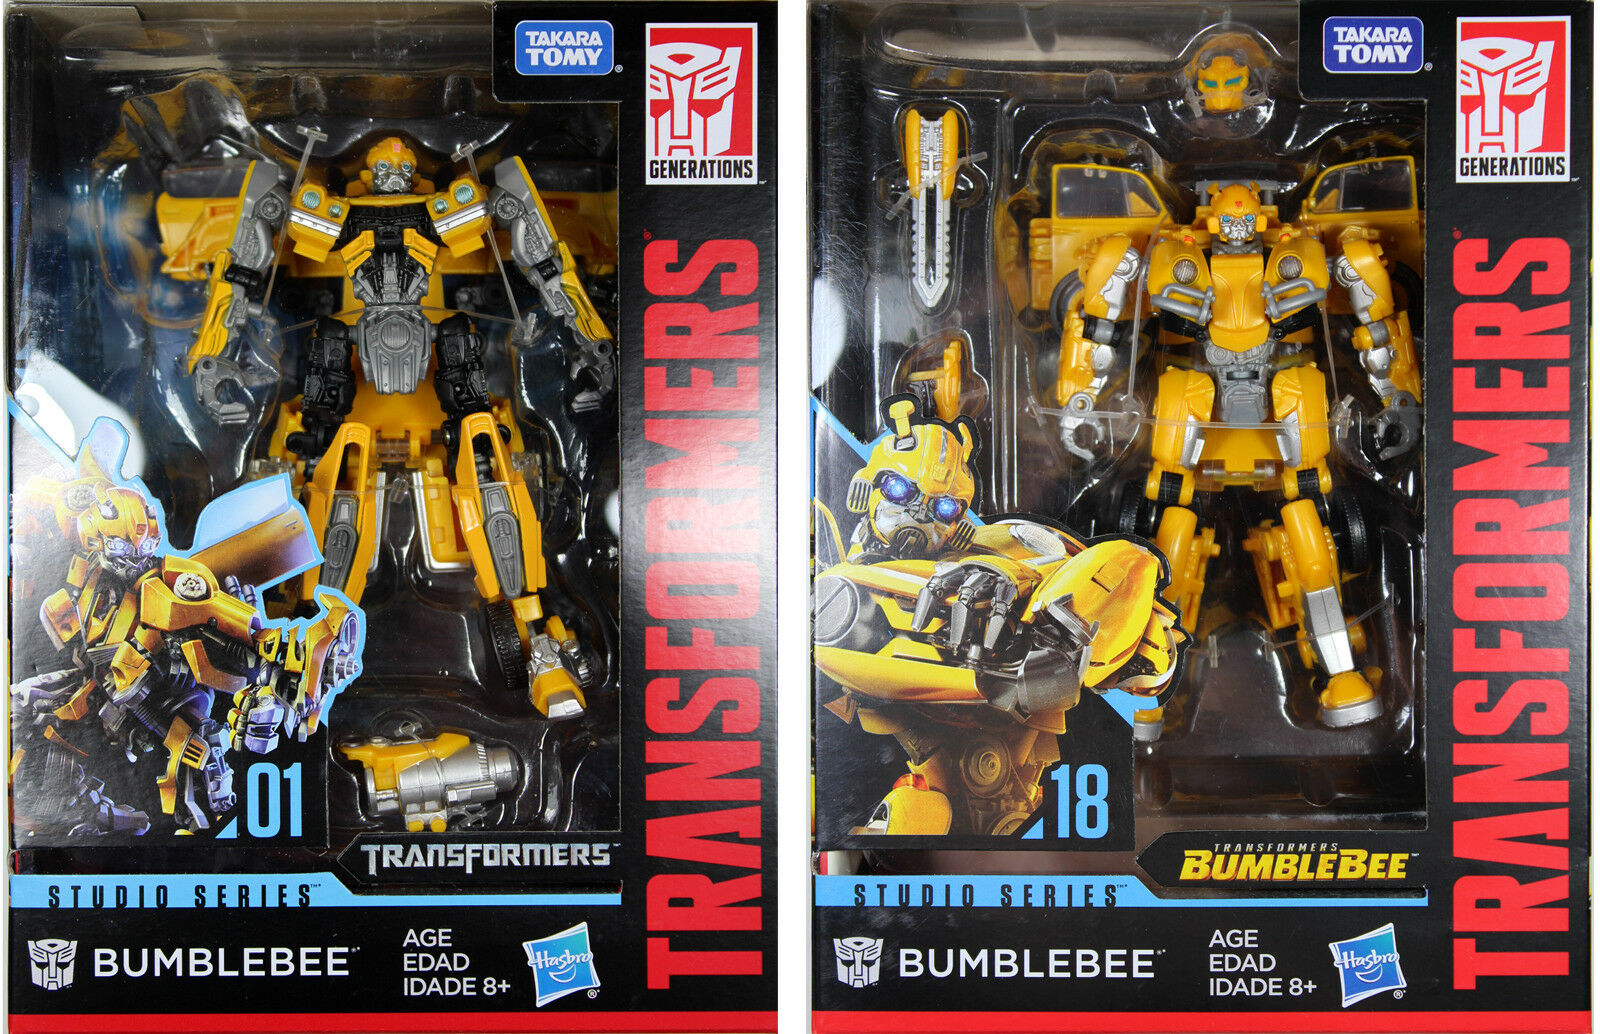 Transformers Studio Series  BUMBLEBEE (CAMARO ) & BUMBLEBEE (VW BEETLE )